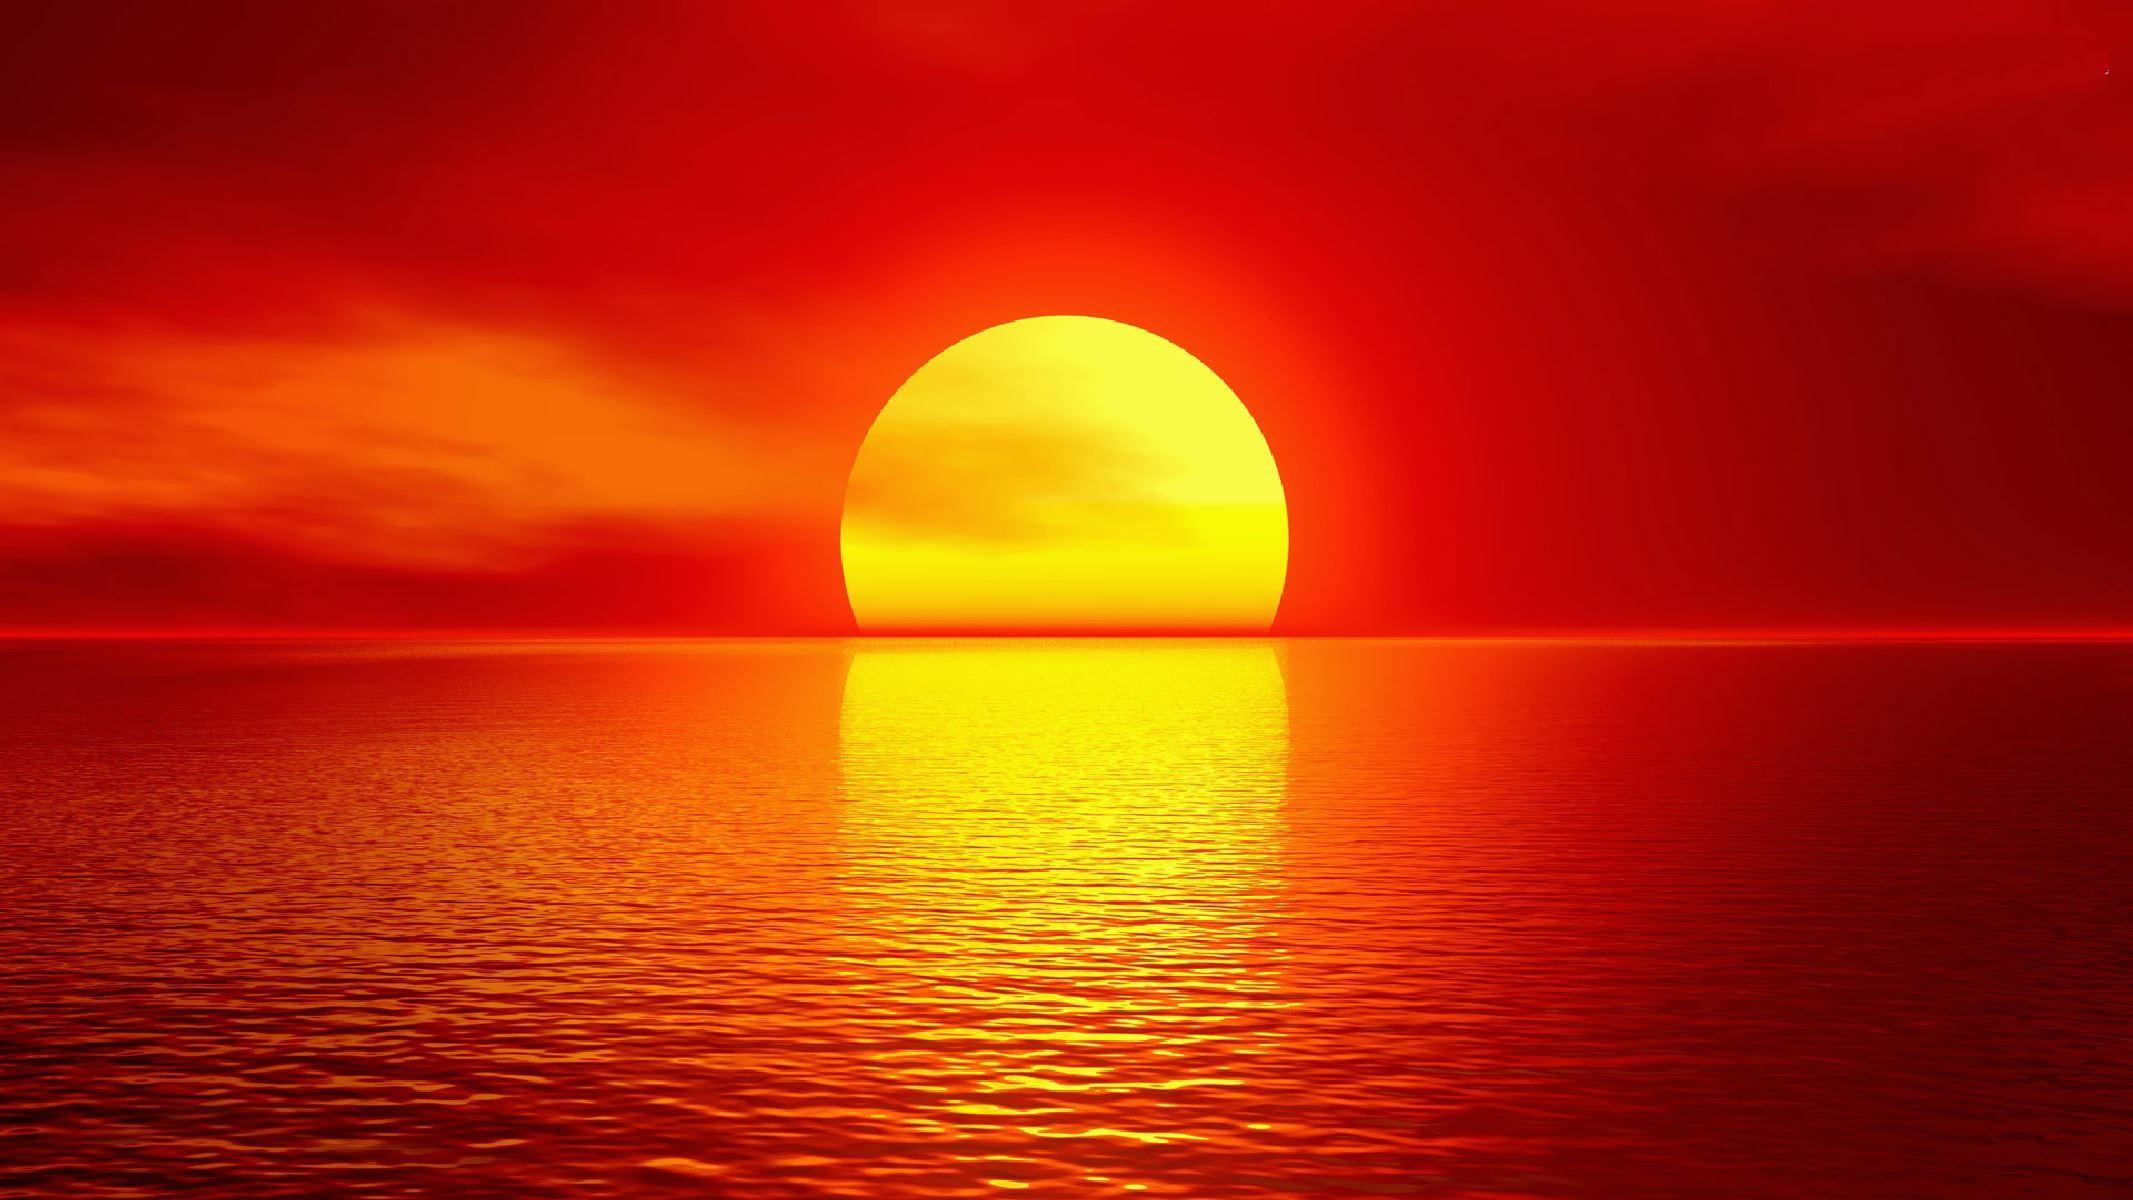 Red Sunset 2133x1200 Wallpaper Teahub Io